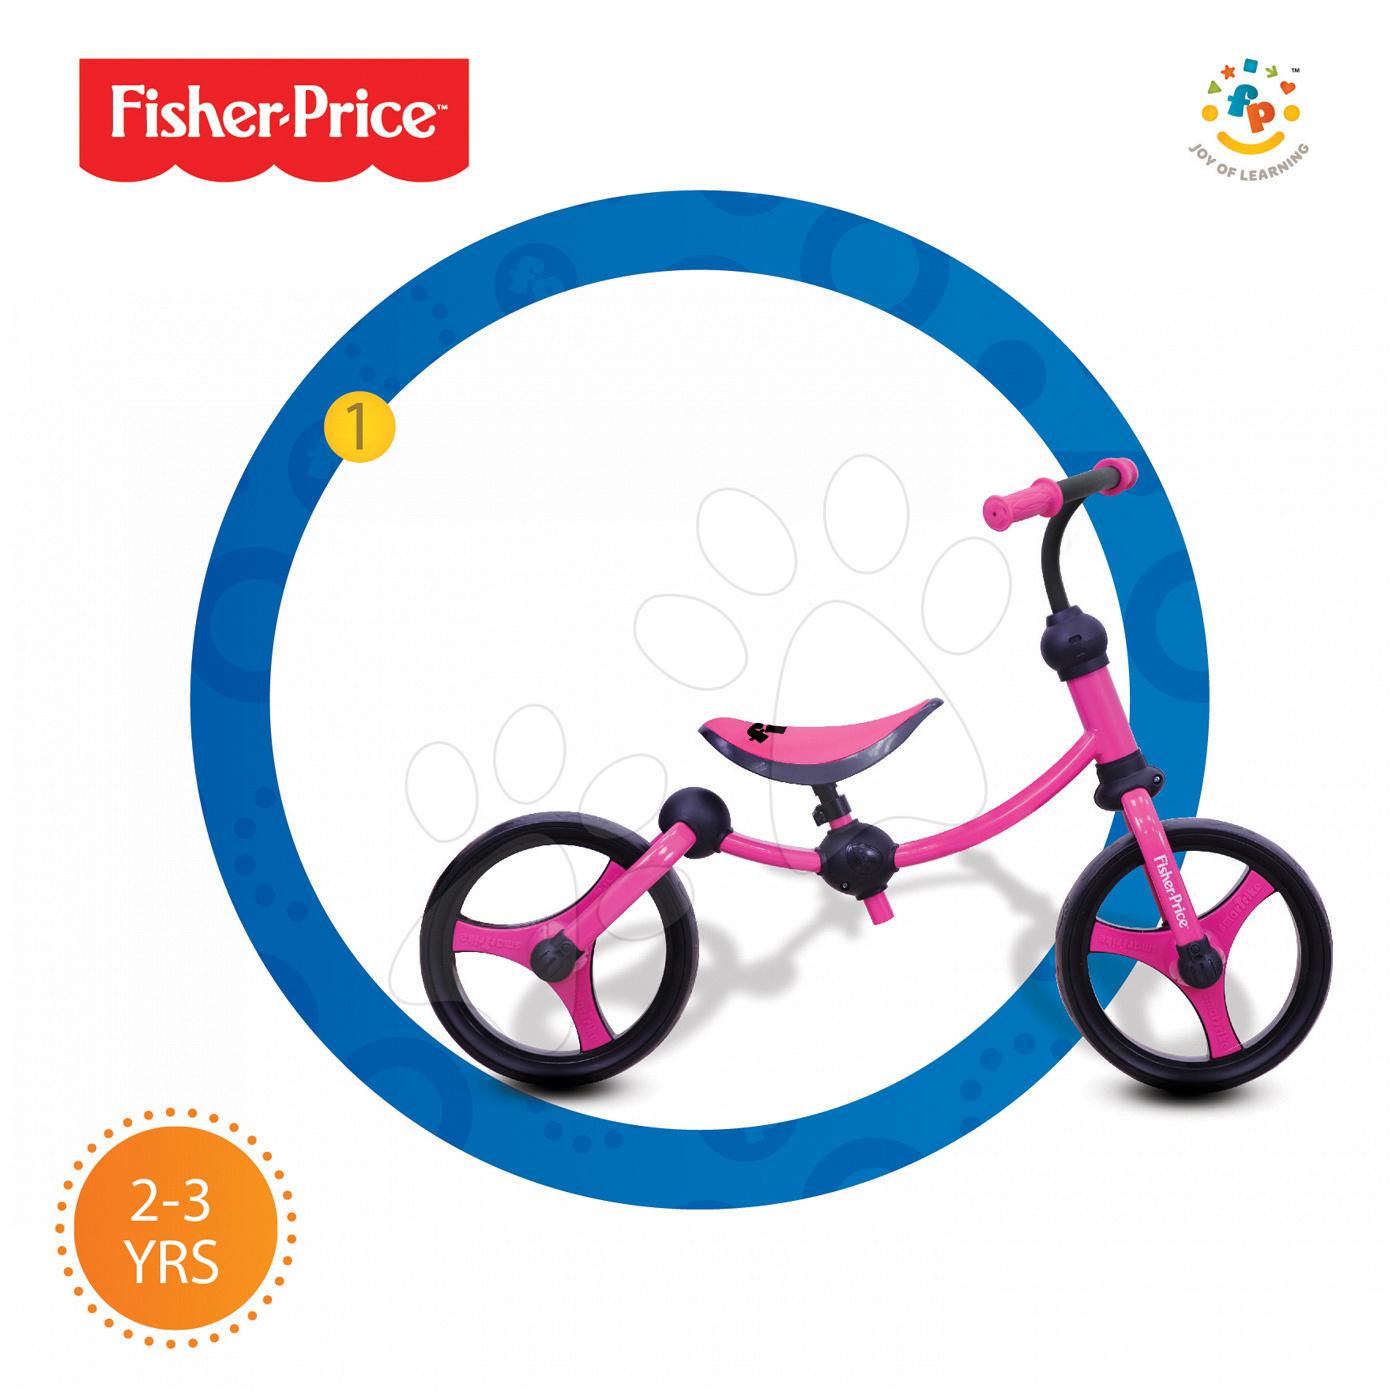 smarTrike detské odrážadlo Fisher-Price Running Bike 2v1 1050233 ružovo-čierne